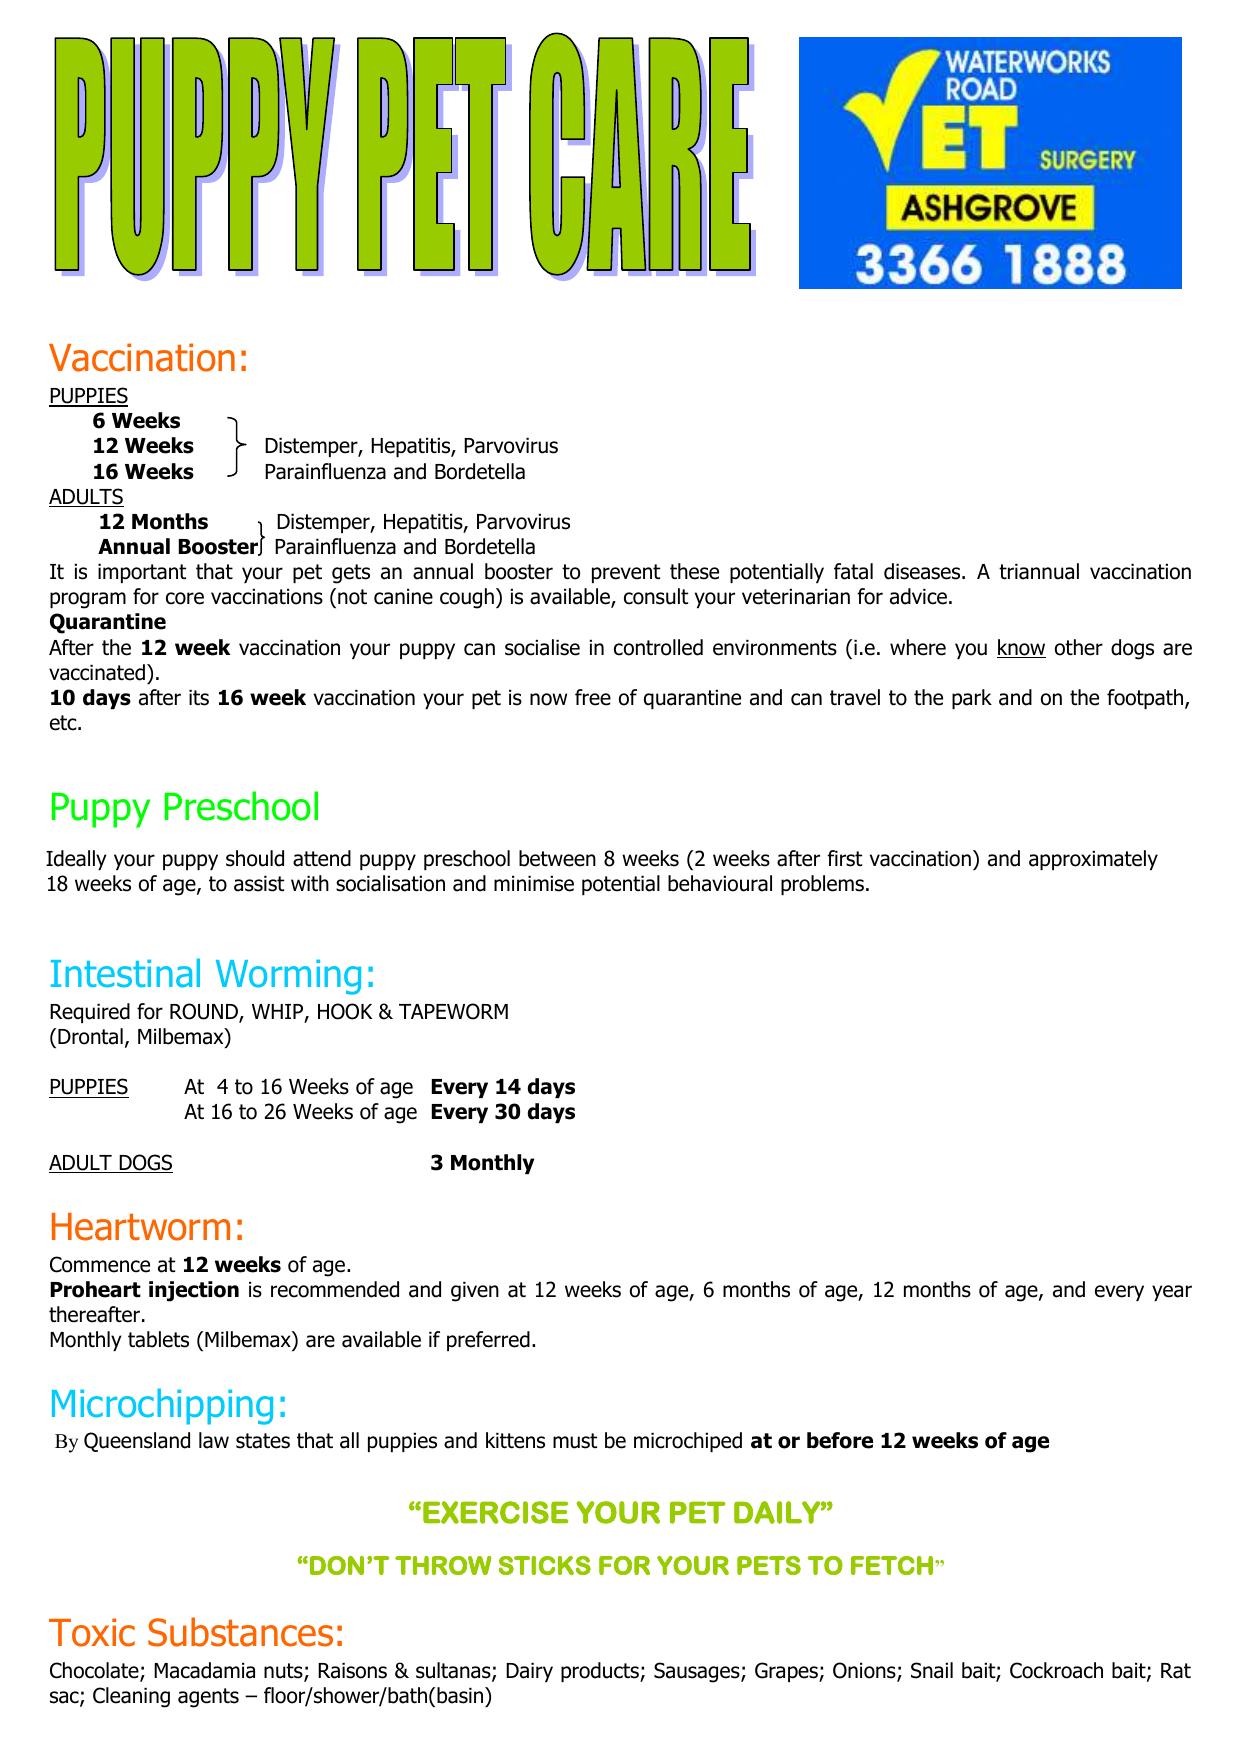 Puppy Pet Care Advice - Waterworks Road Vet Surgery